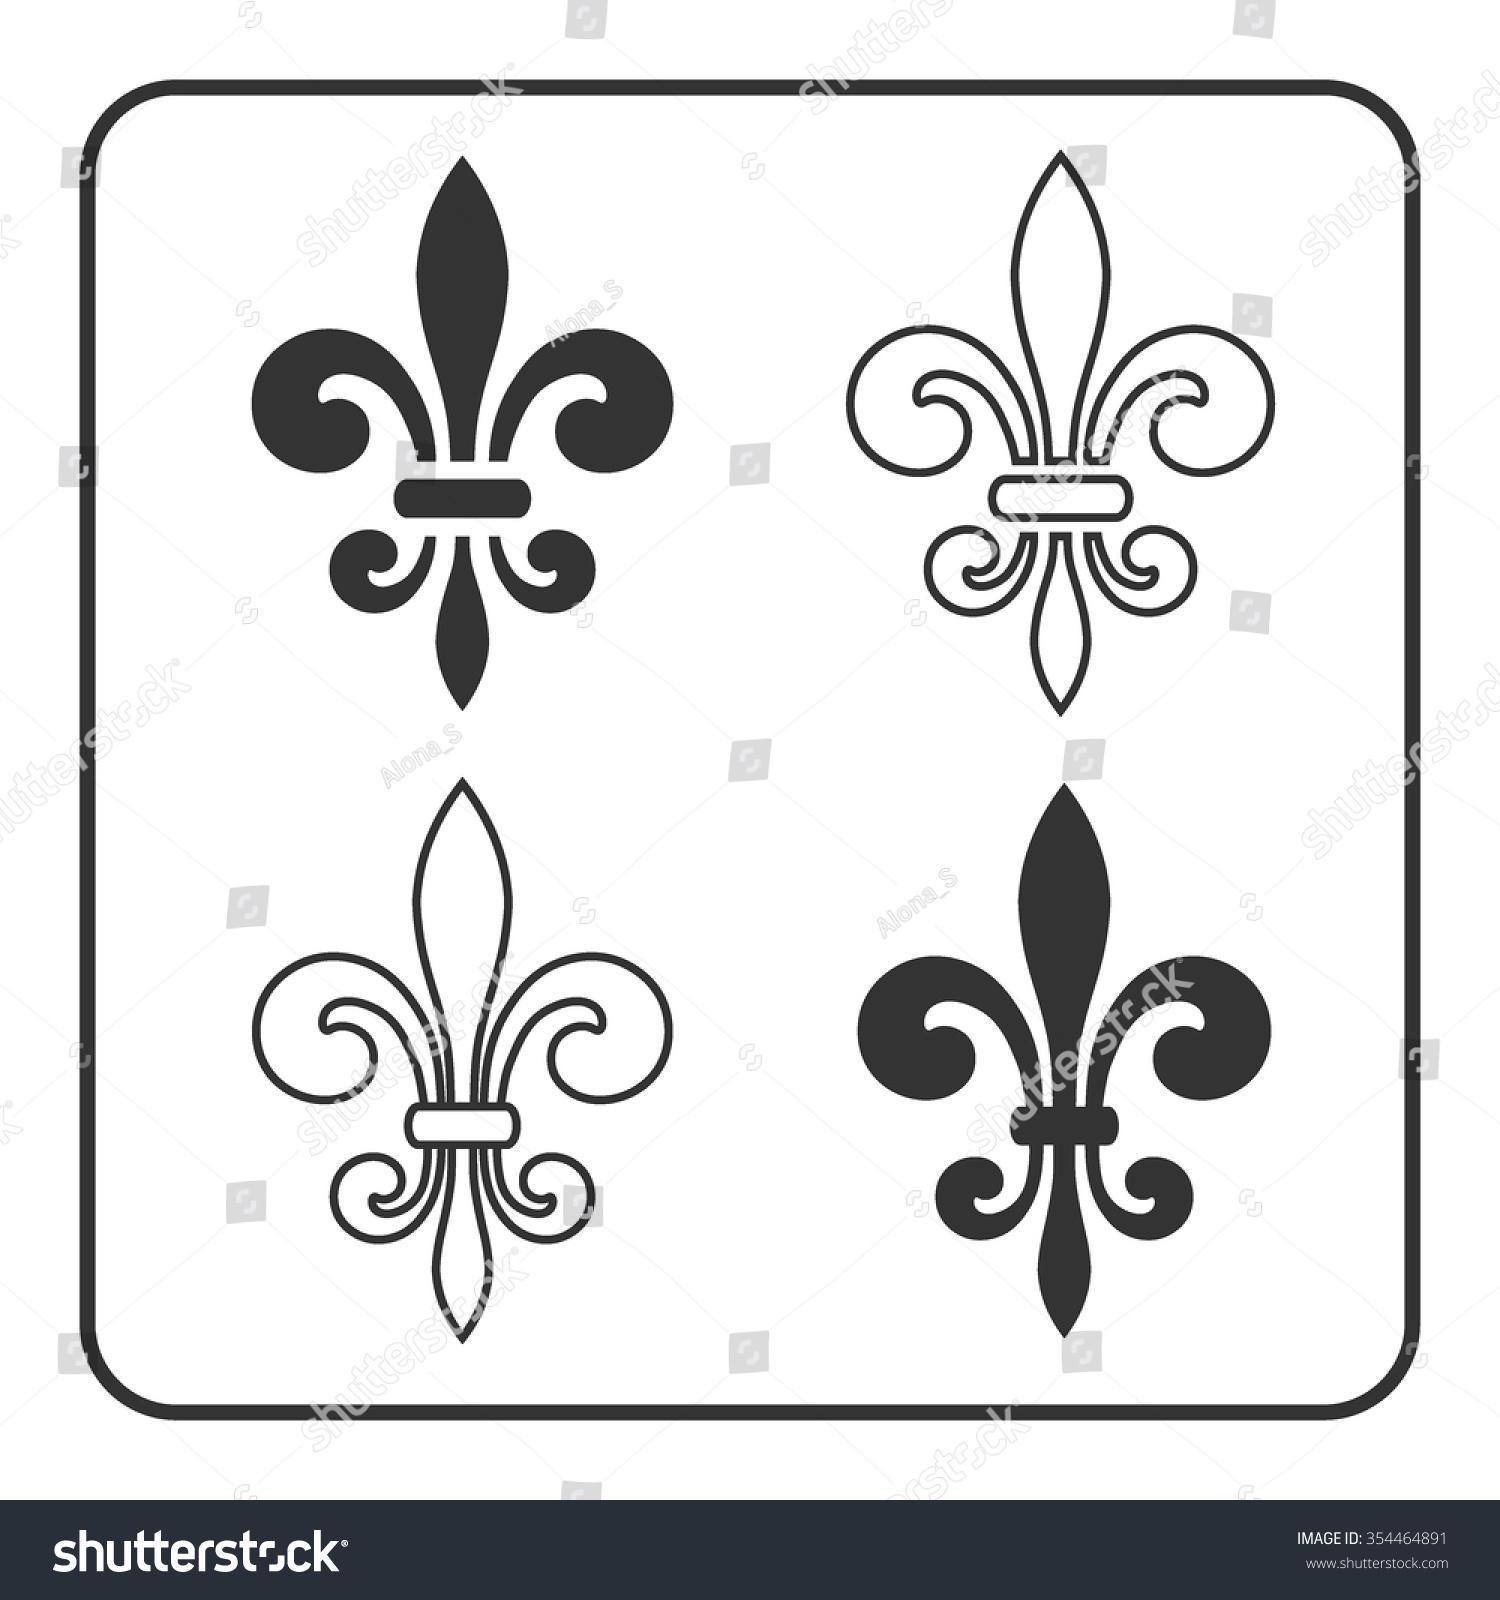 Fleur de Lis symbol set. Fleur-de-Lis sign. Royal french lily. Heraldic  icon for design, logo, decoration. Elegant flower outline design.